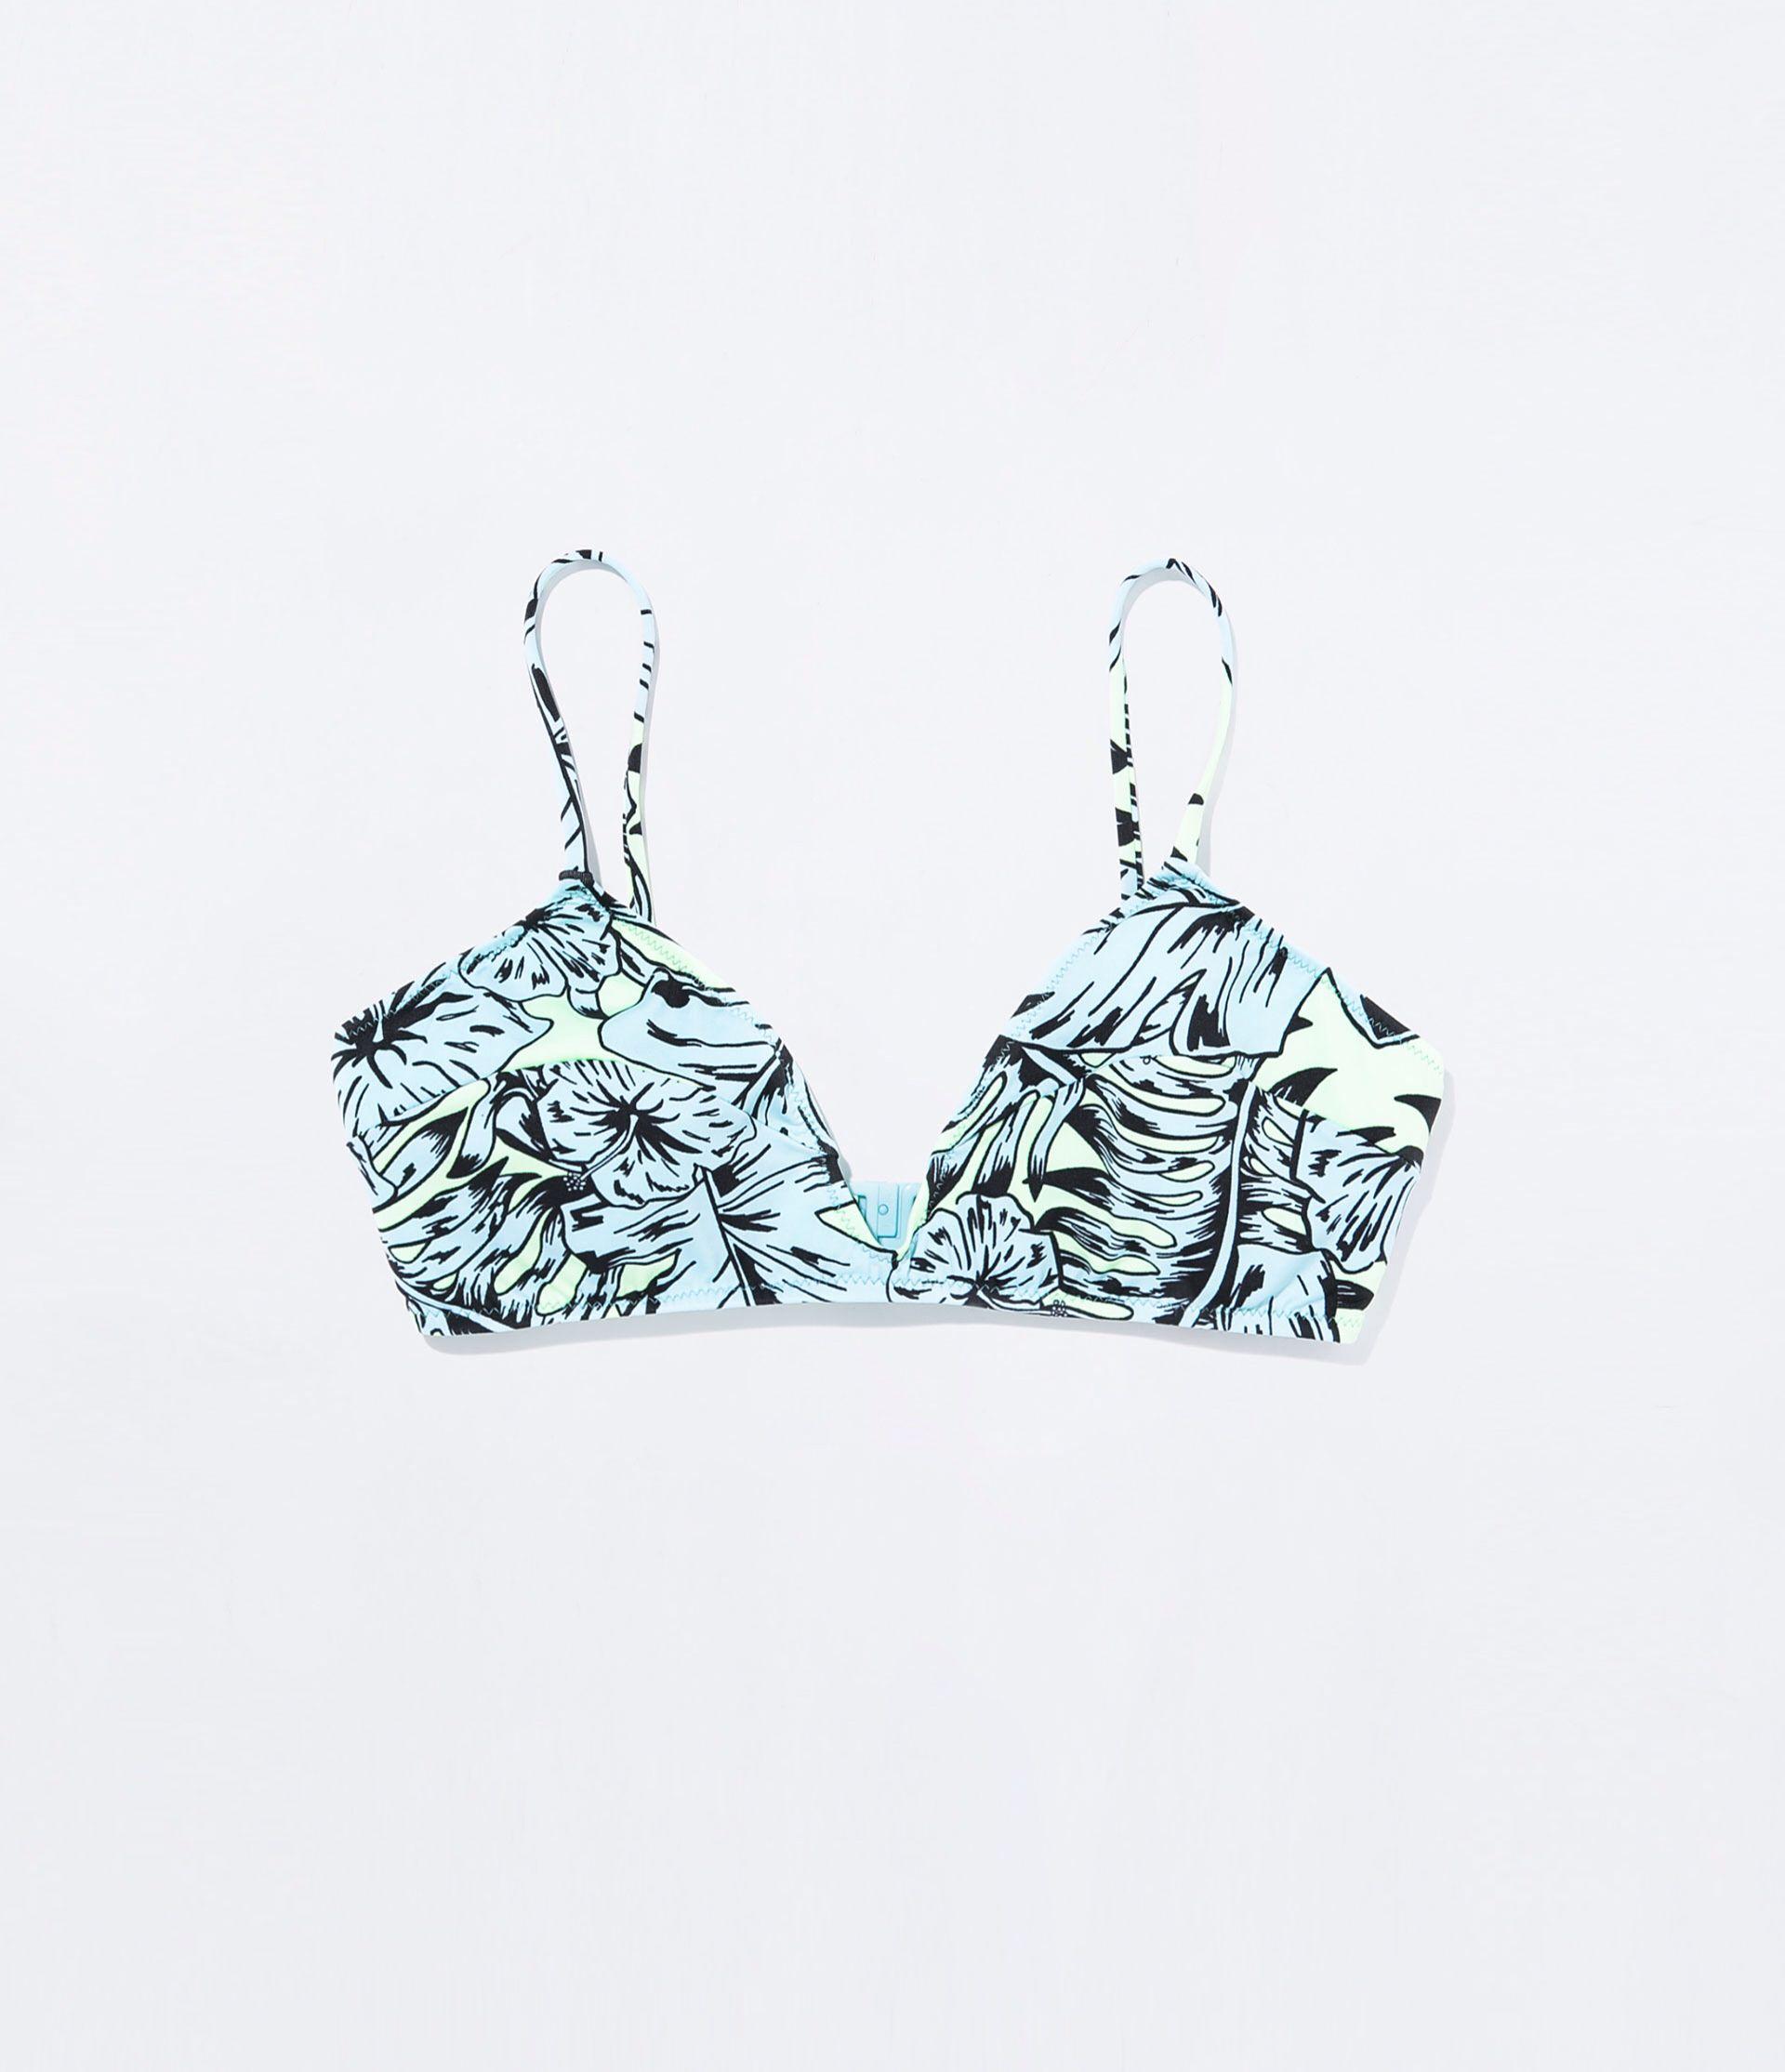 Zara swimwear❤ WANTED!   Swim/underwear   Pinterest   Swimwear ...